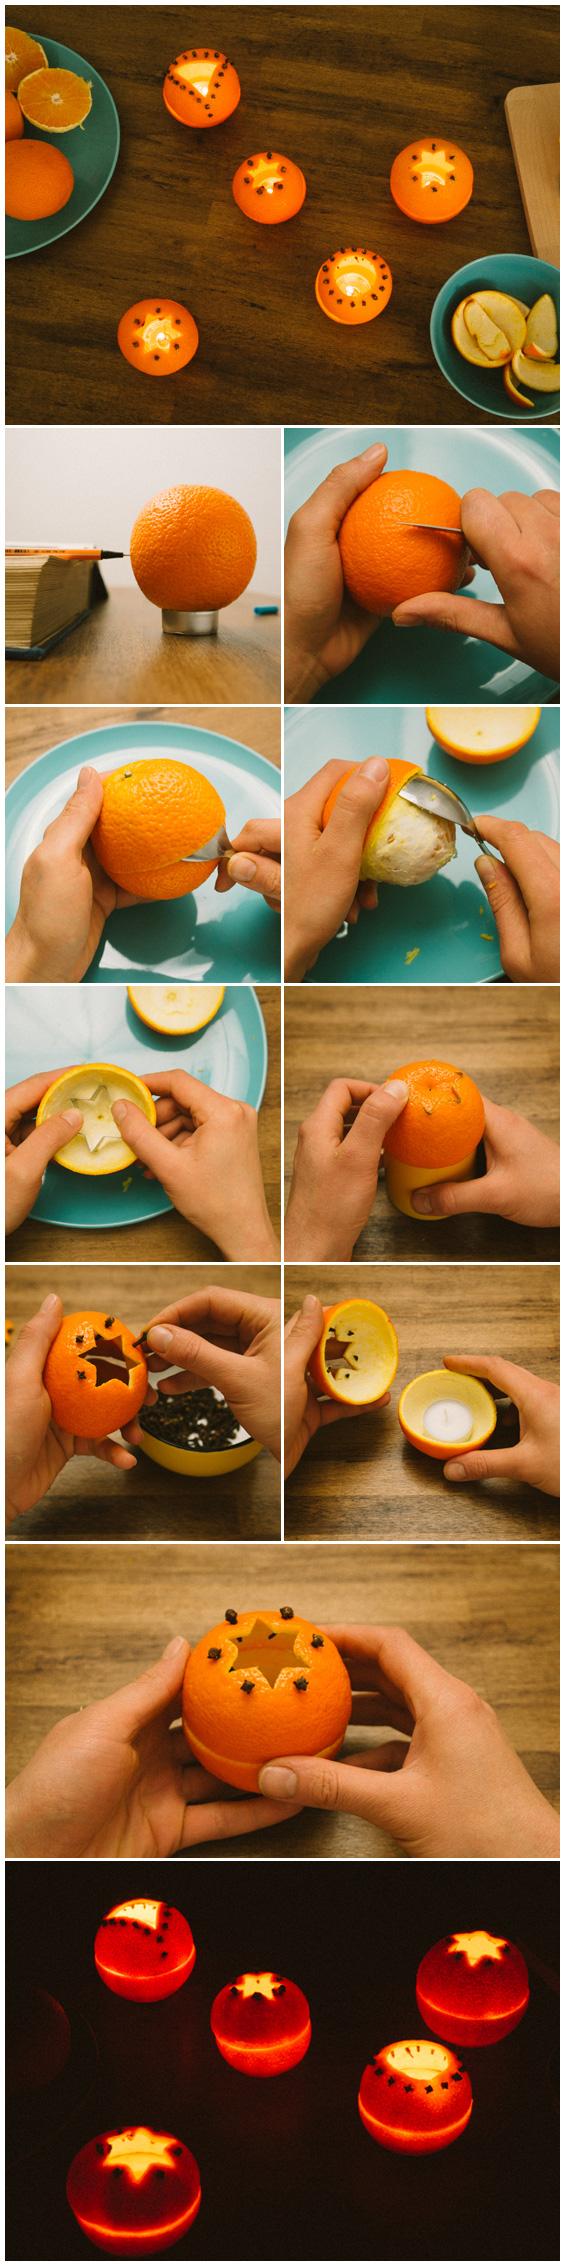 orange peel candle diy